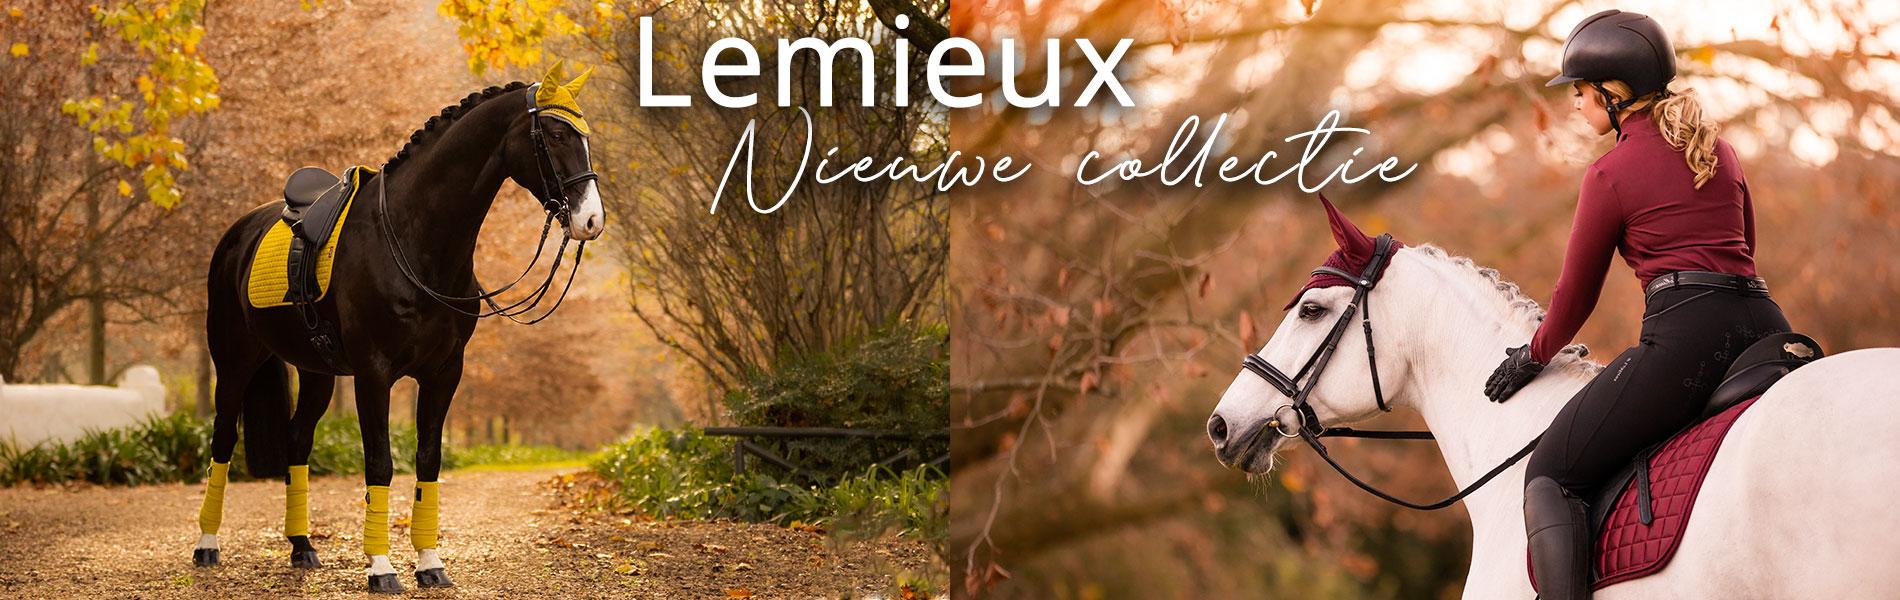 LeMieux AW 2021 wintercollectie